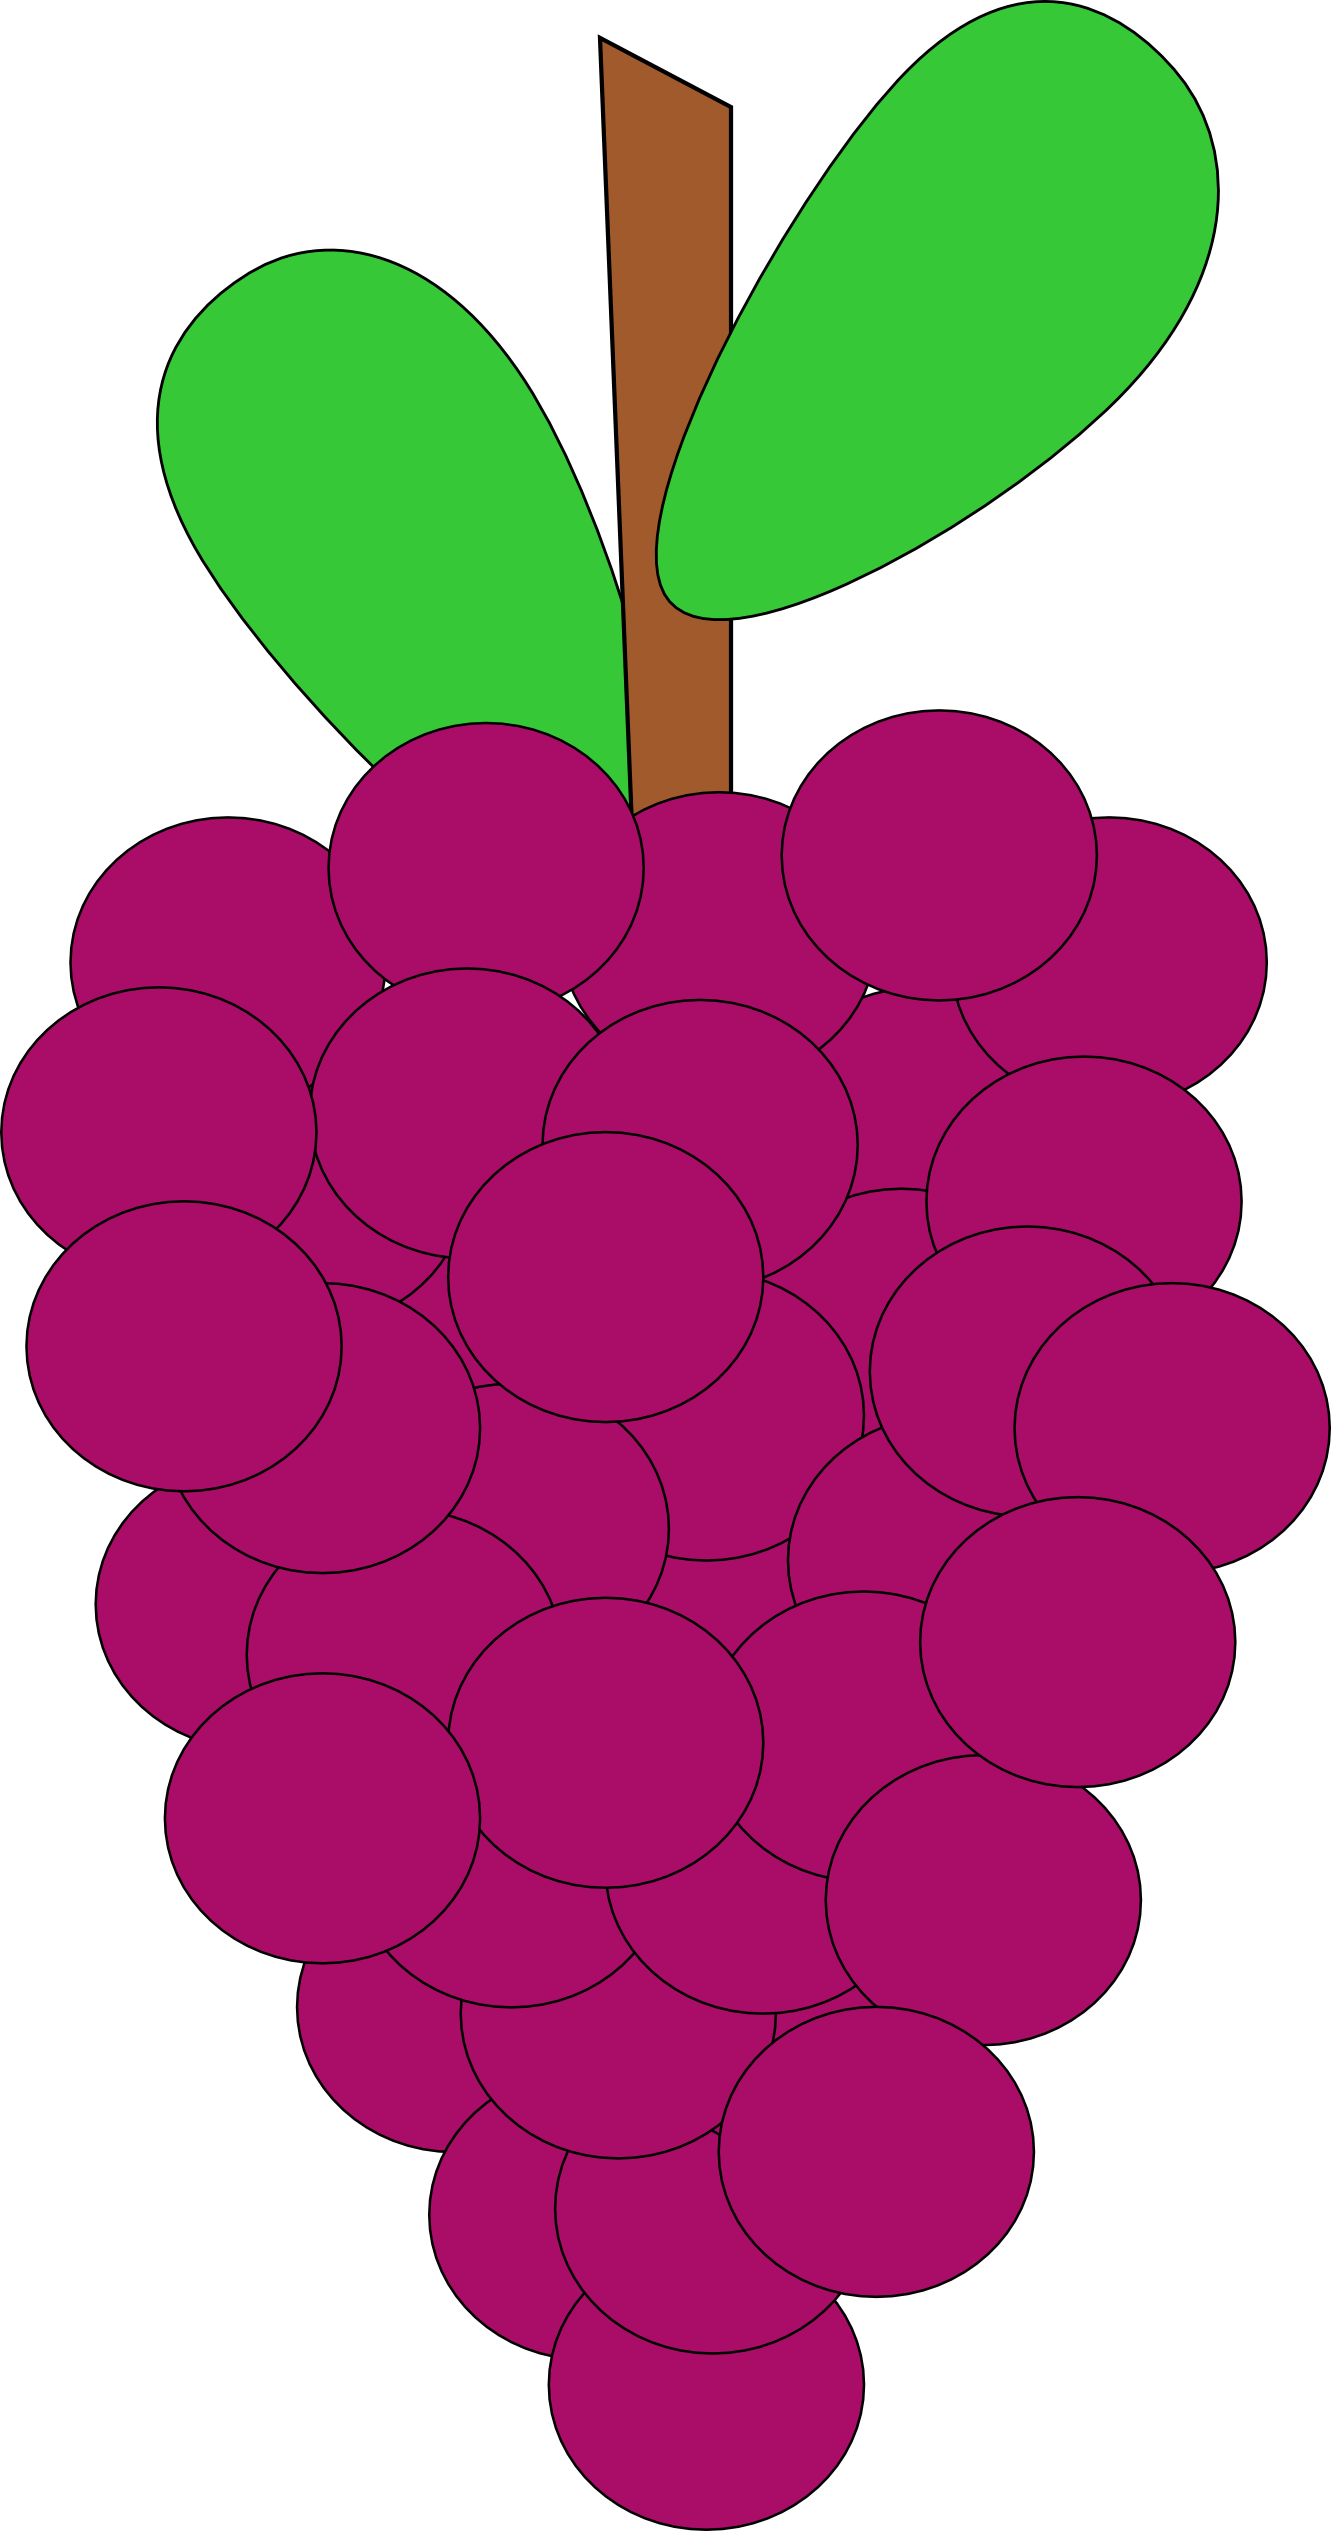 Grape clipart ubas. Vine pencil and in